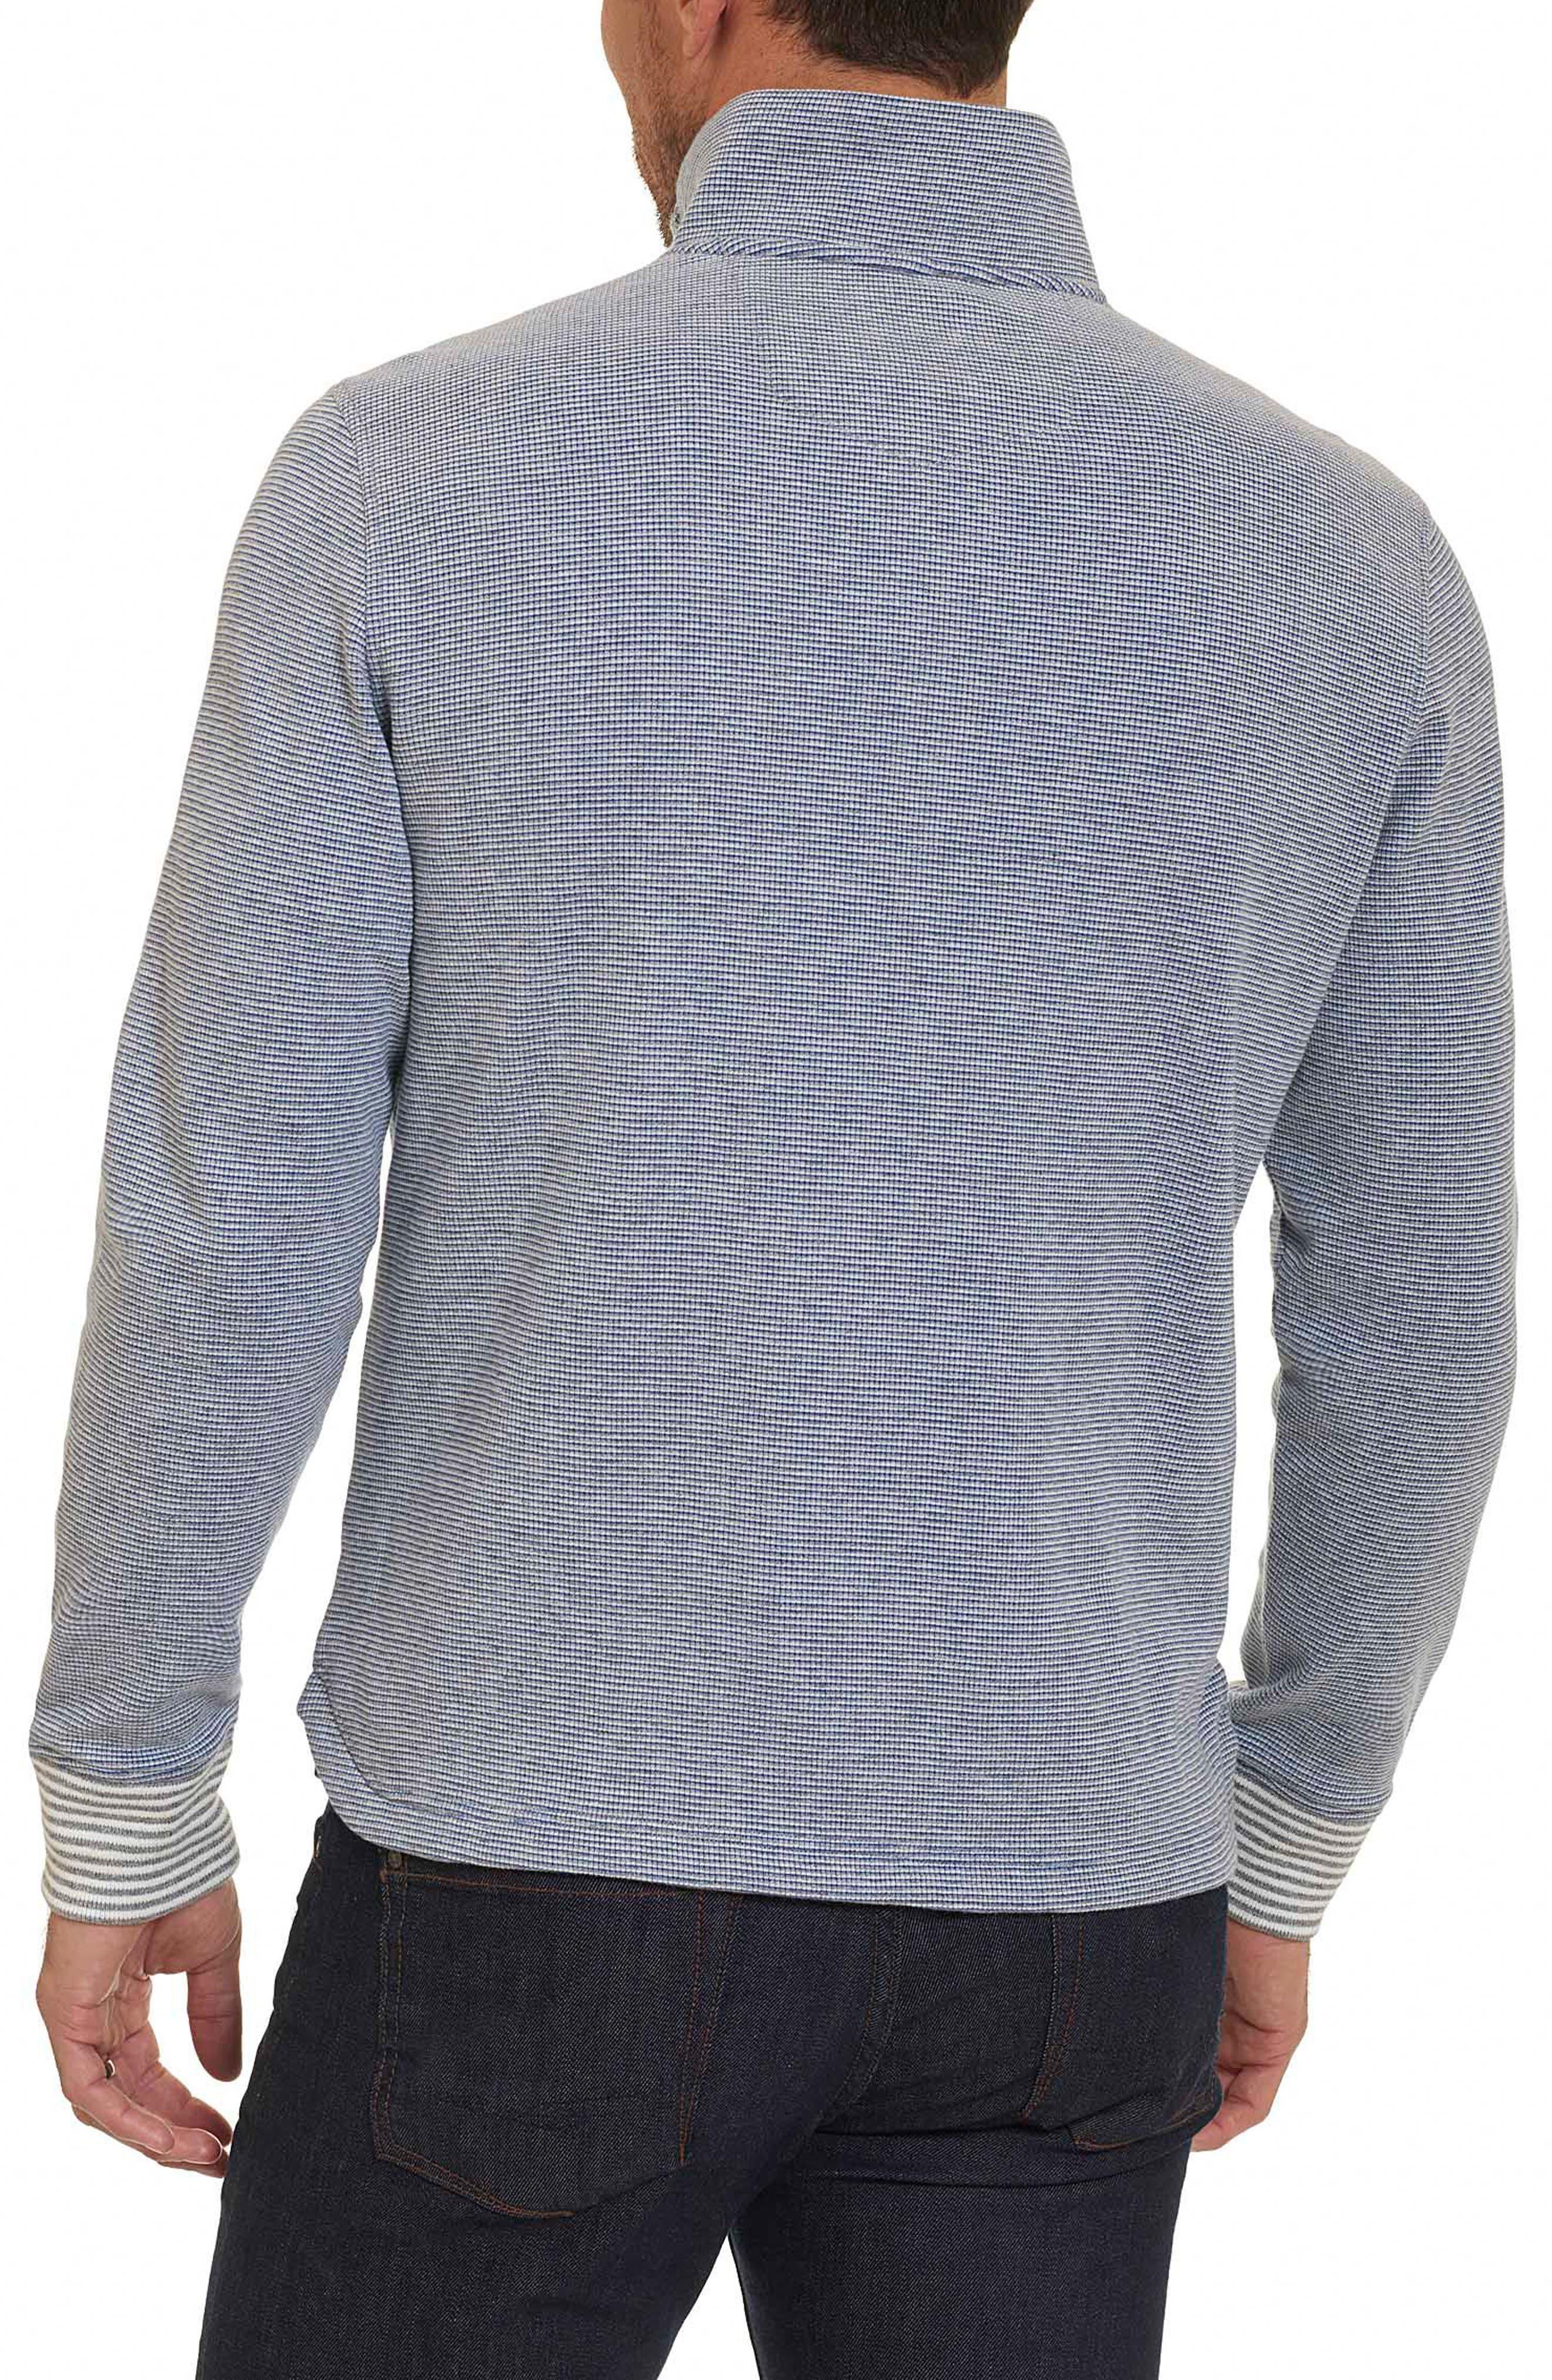 Poole Regular Fit Quarter Zip Pullover,                             Alternate thumbnail 2, color,                             020